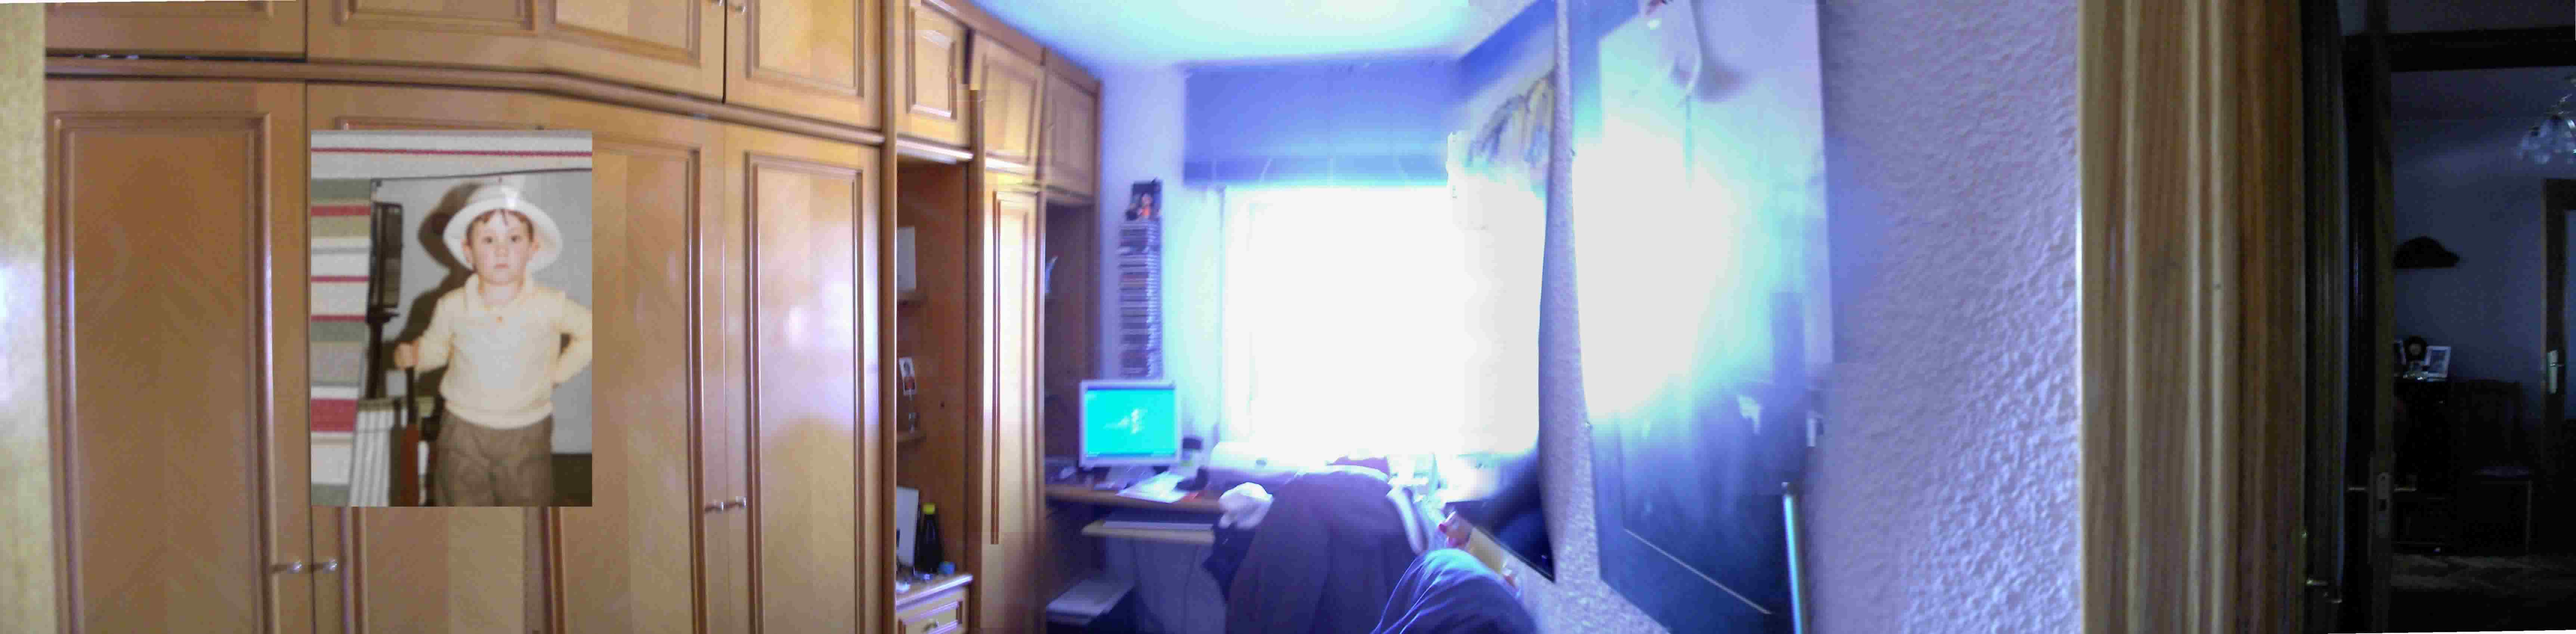 in_my_room.jpg